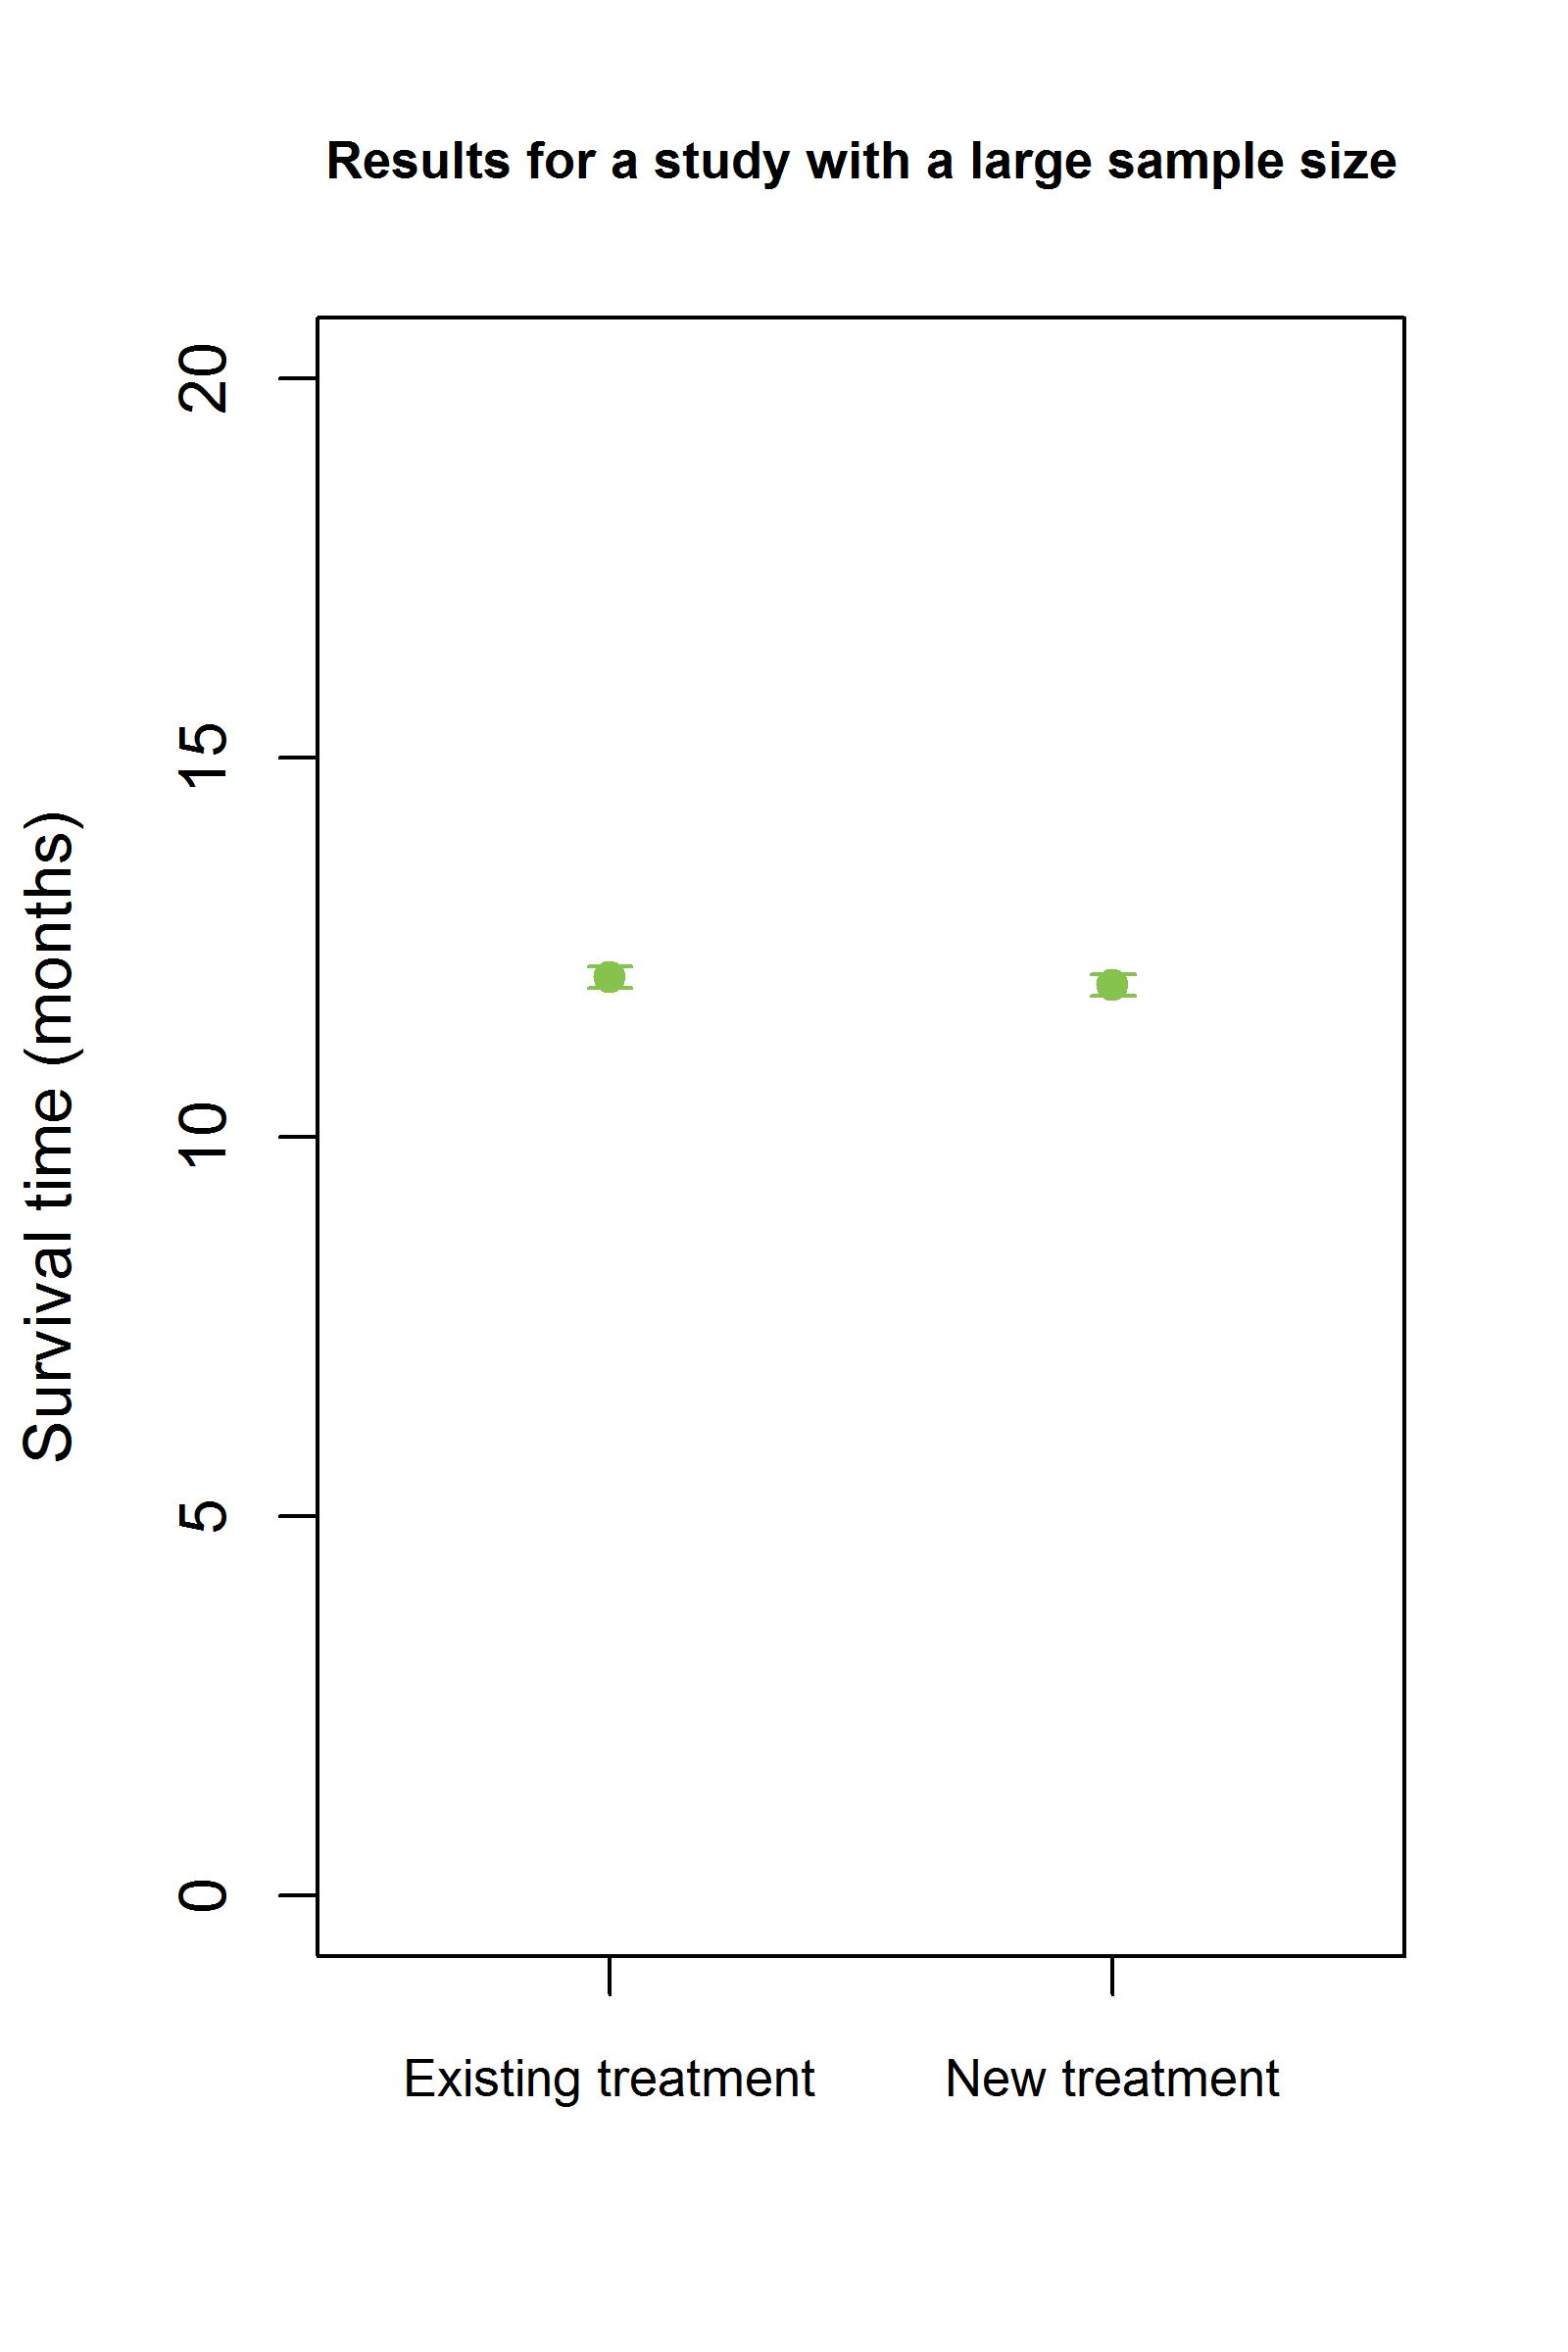 Large sample